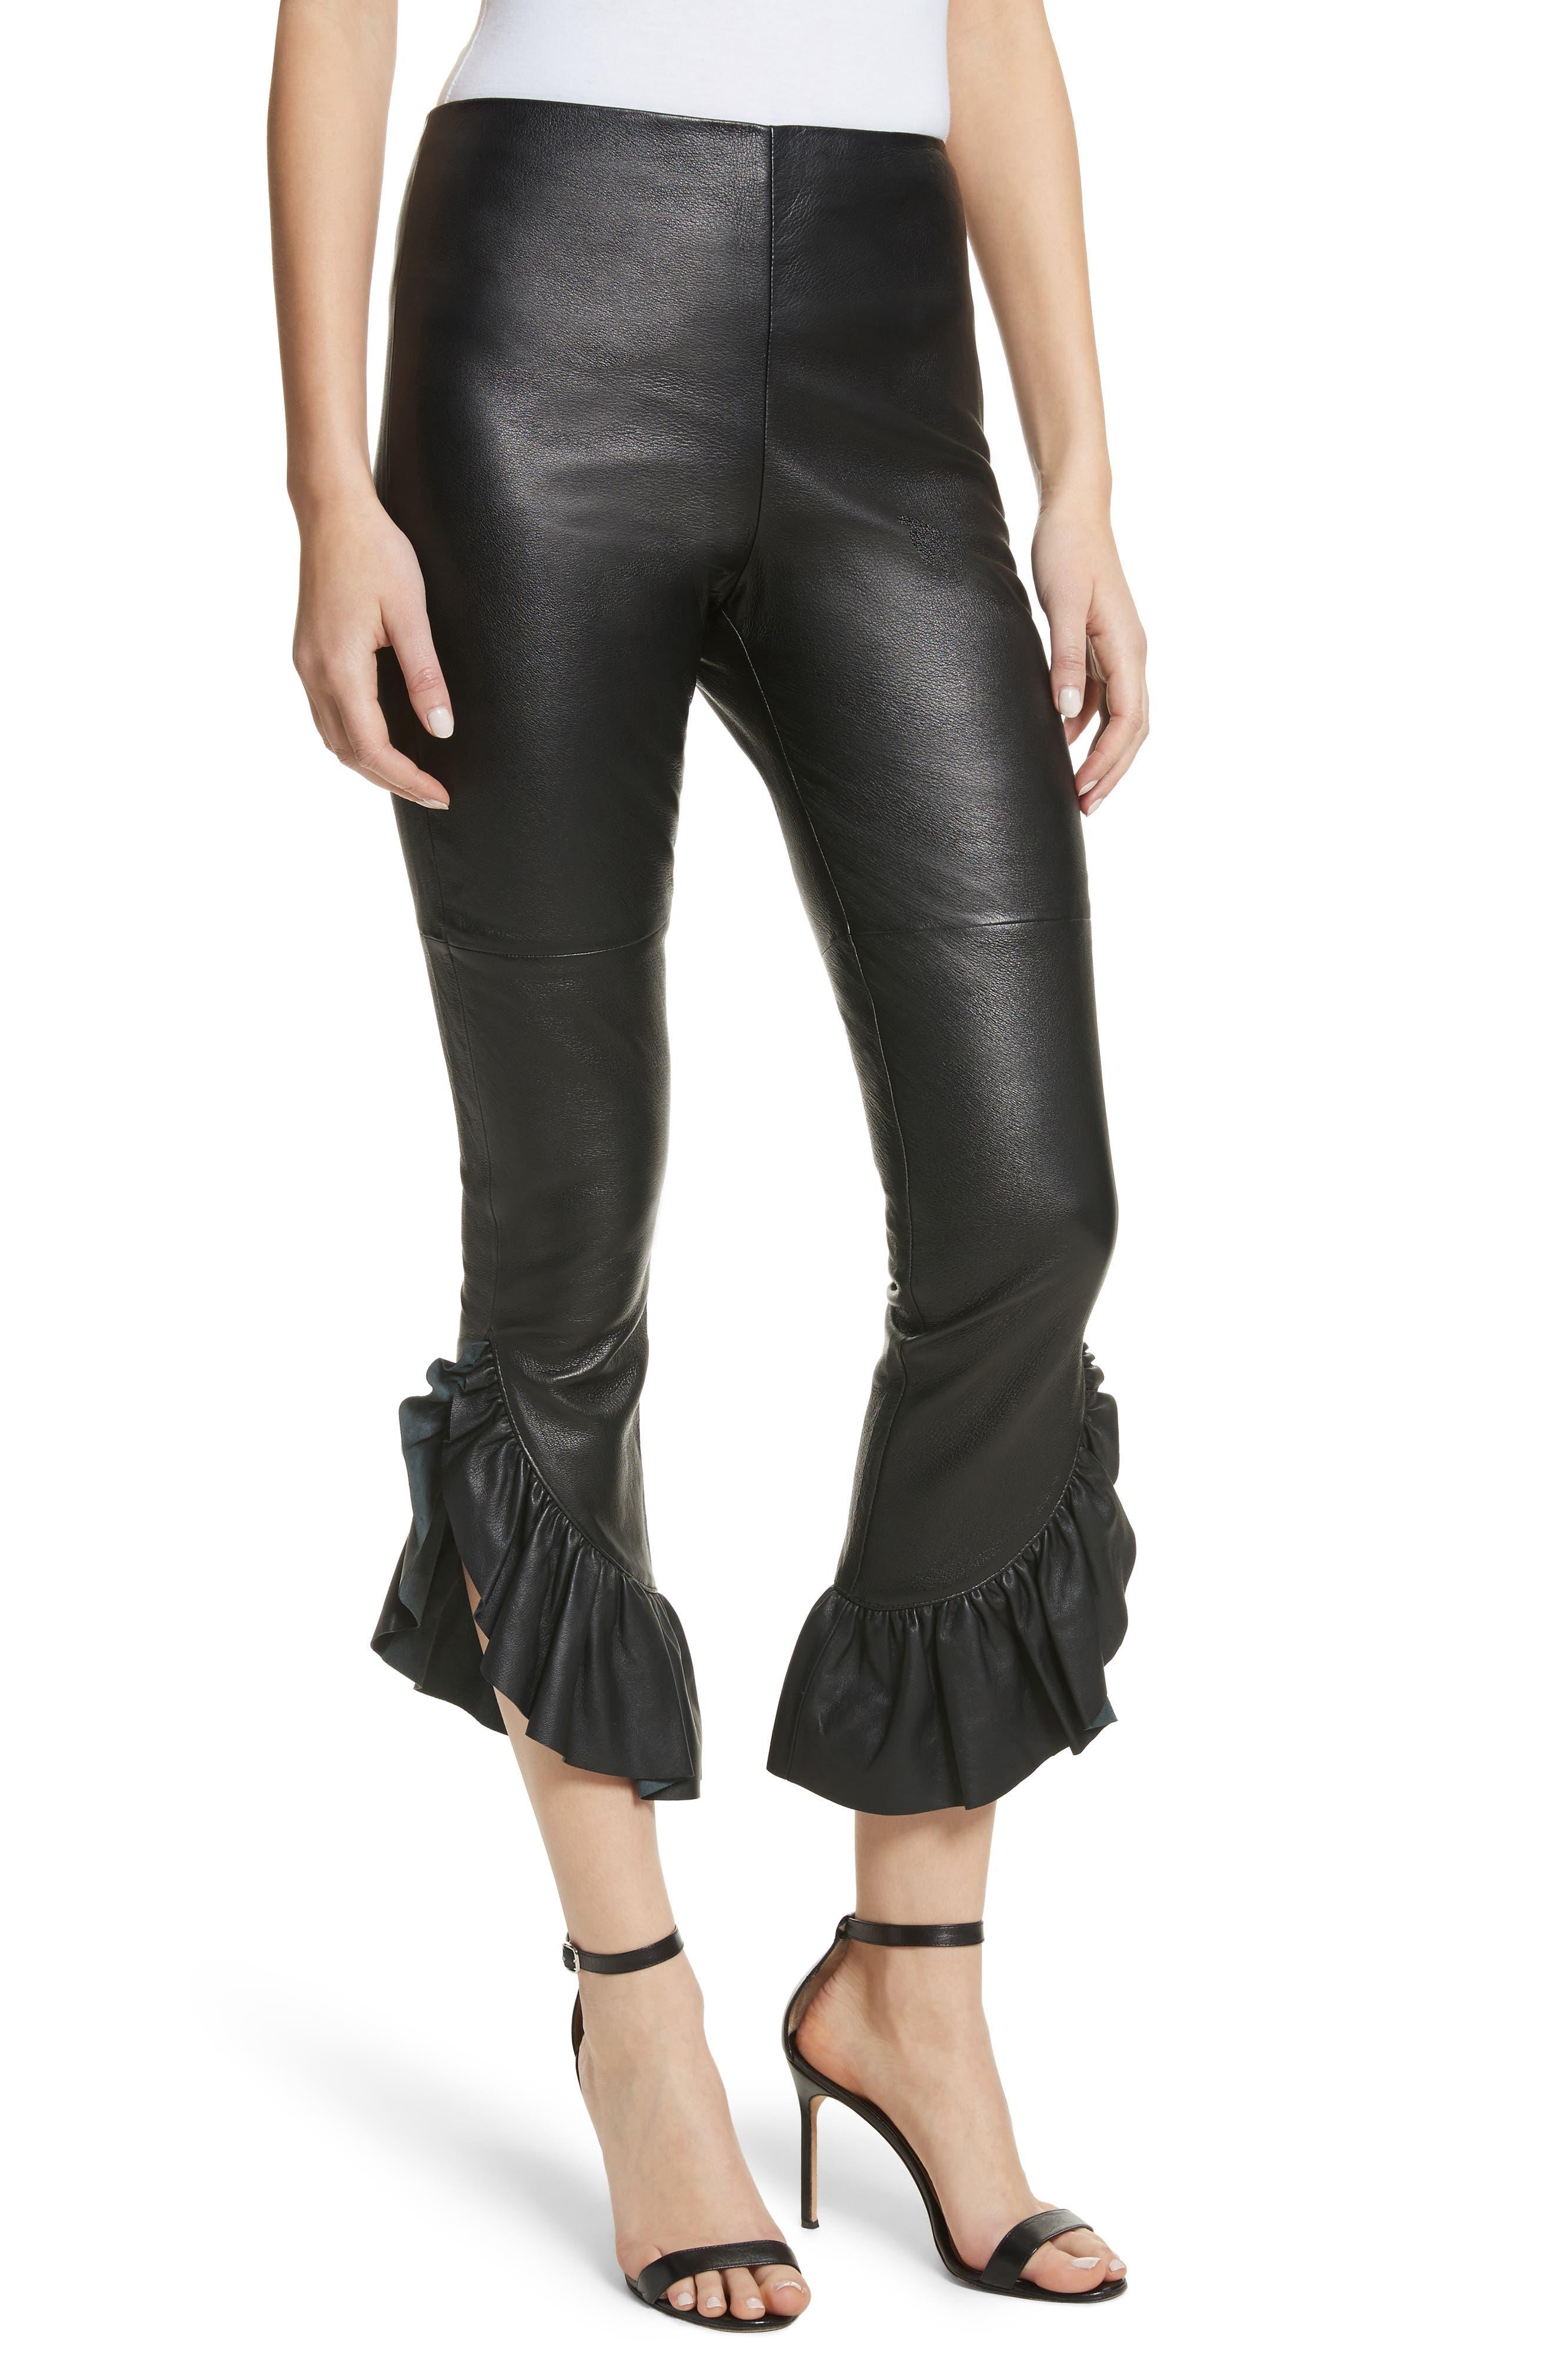 Gionata Ruffle Hem Leather Pants,                         Main,                         color, Black